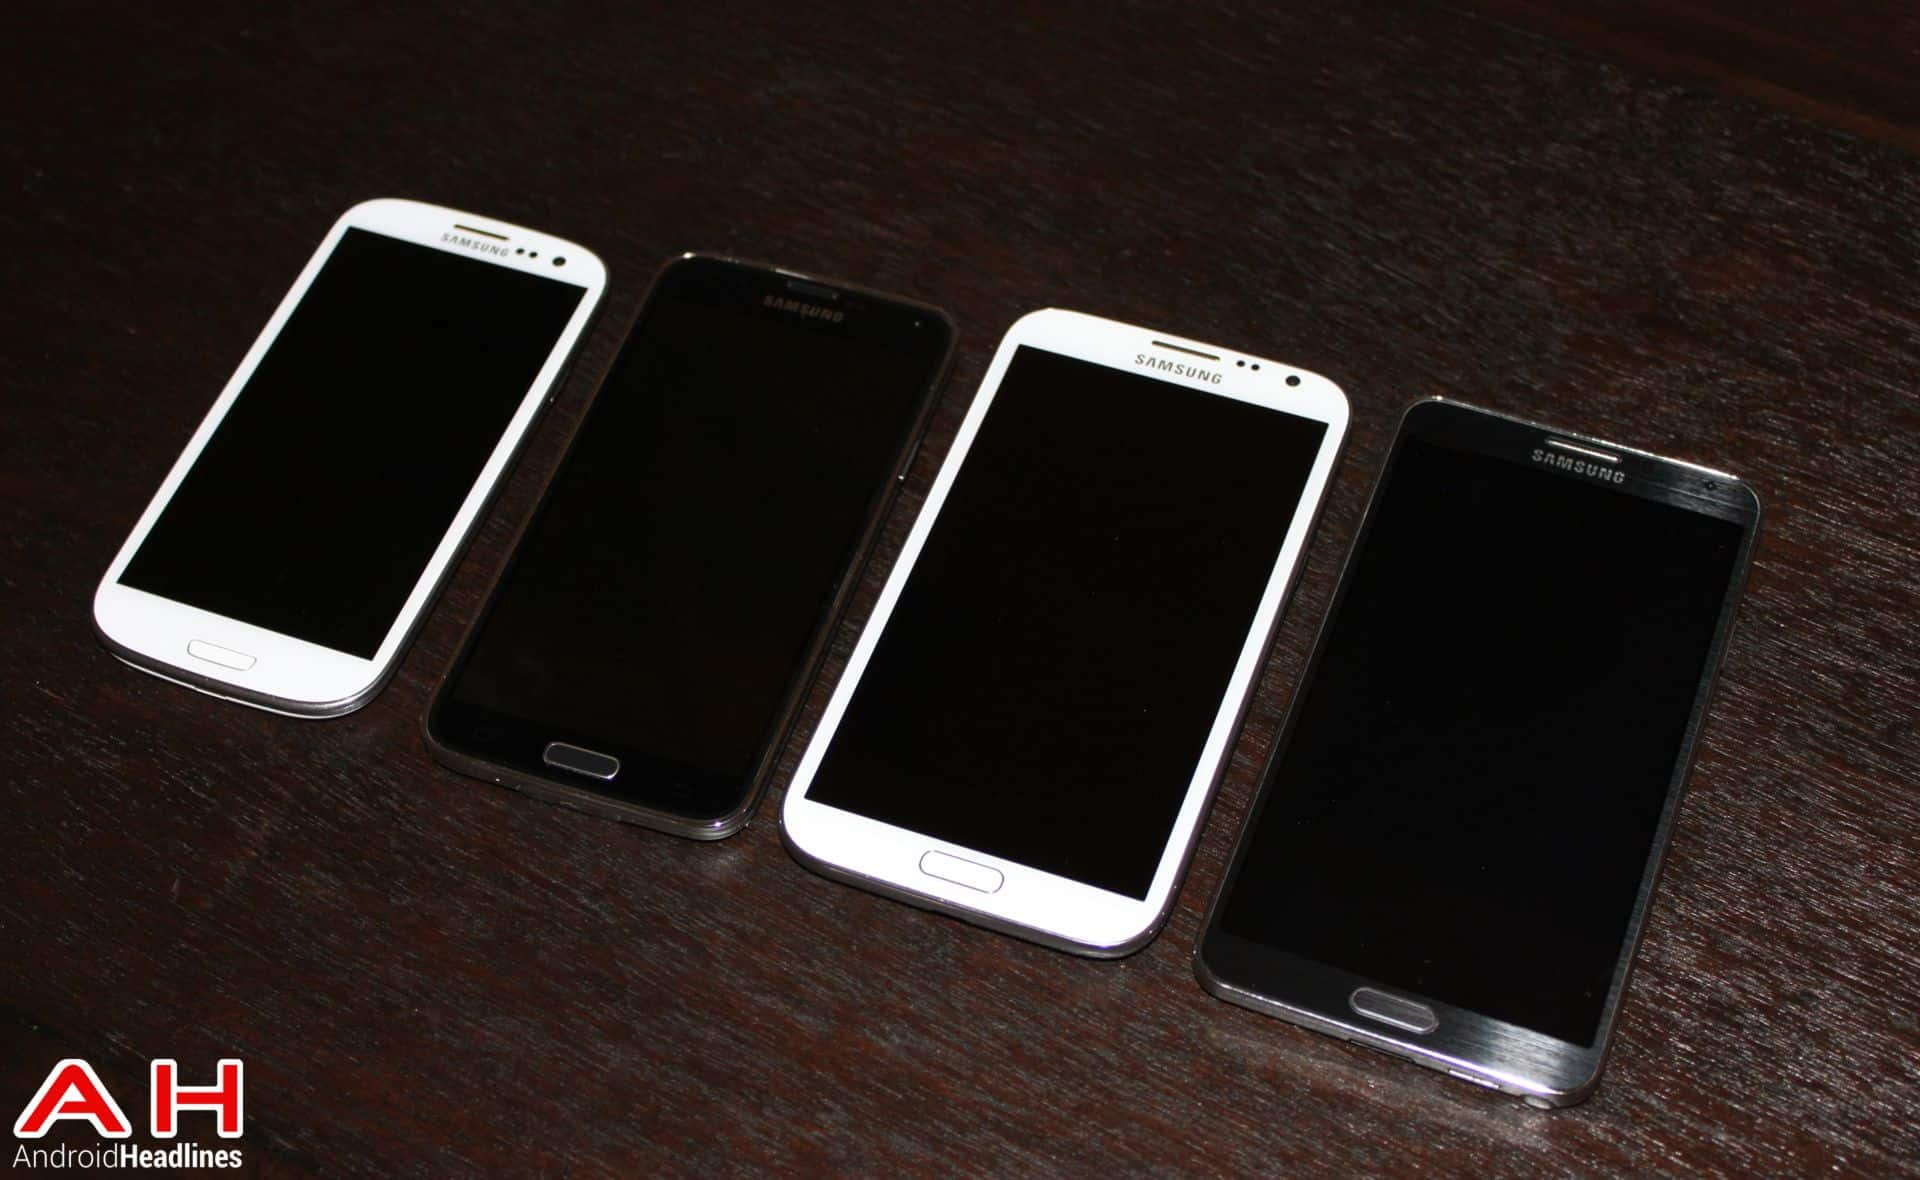 AH Samsung Galaxy S5 Galxy Note 3 Galxy Note 2 Galaxy S3  Logo 2.3